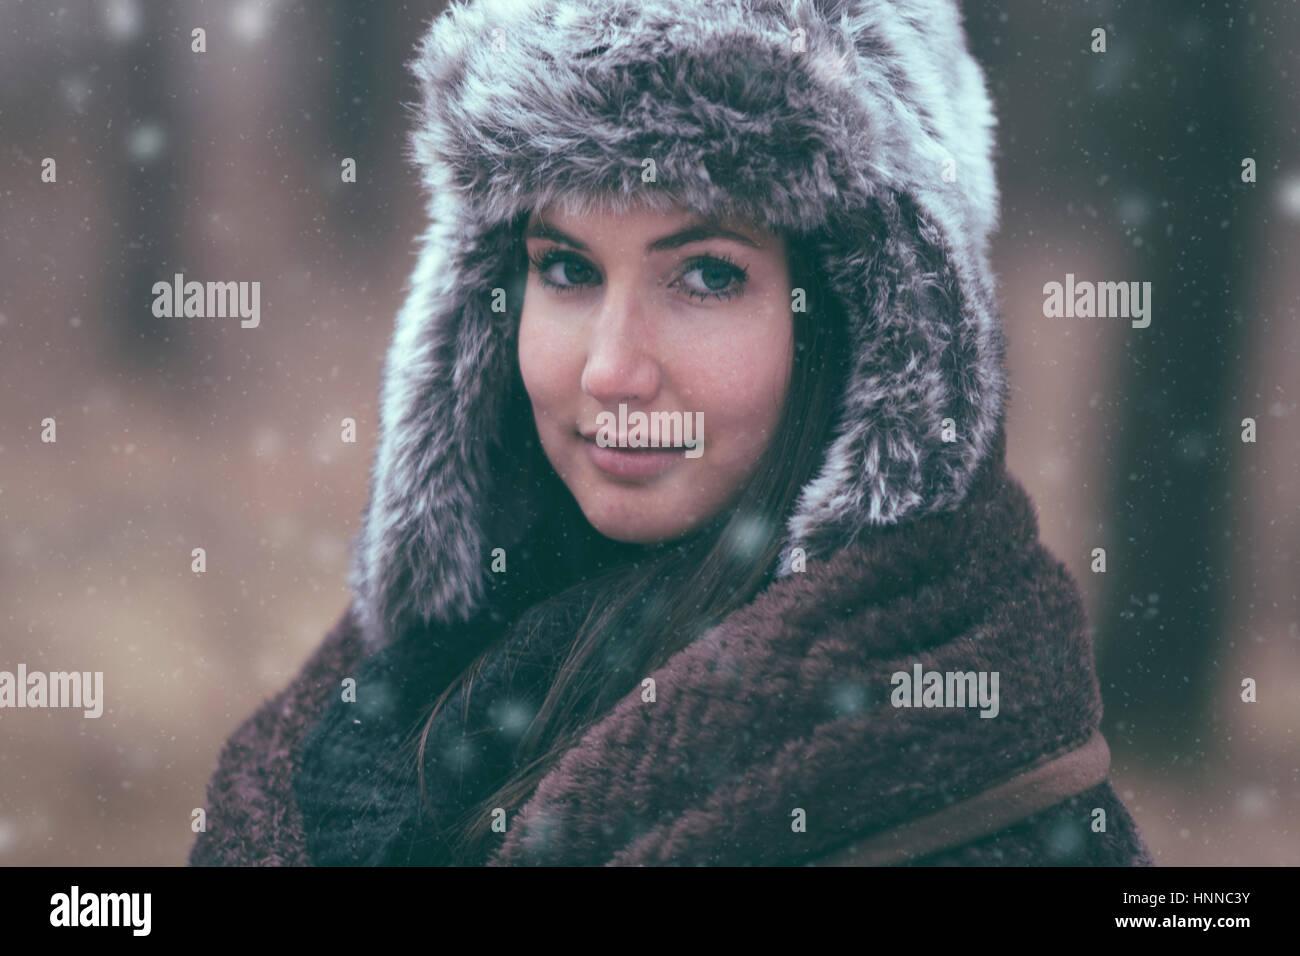 Frau in Schneefall Stockbild